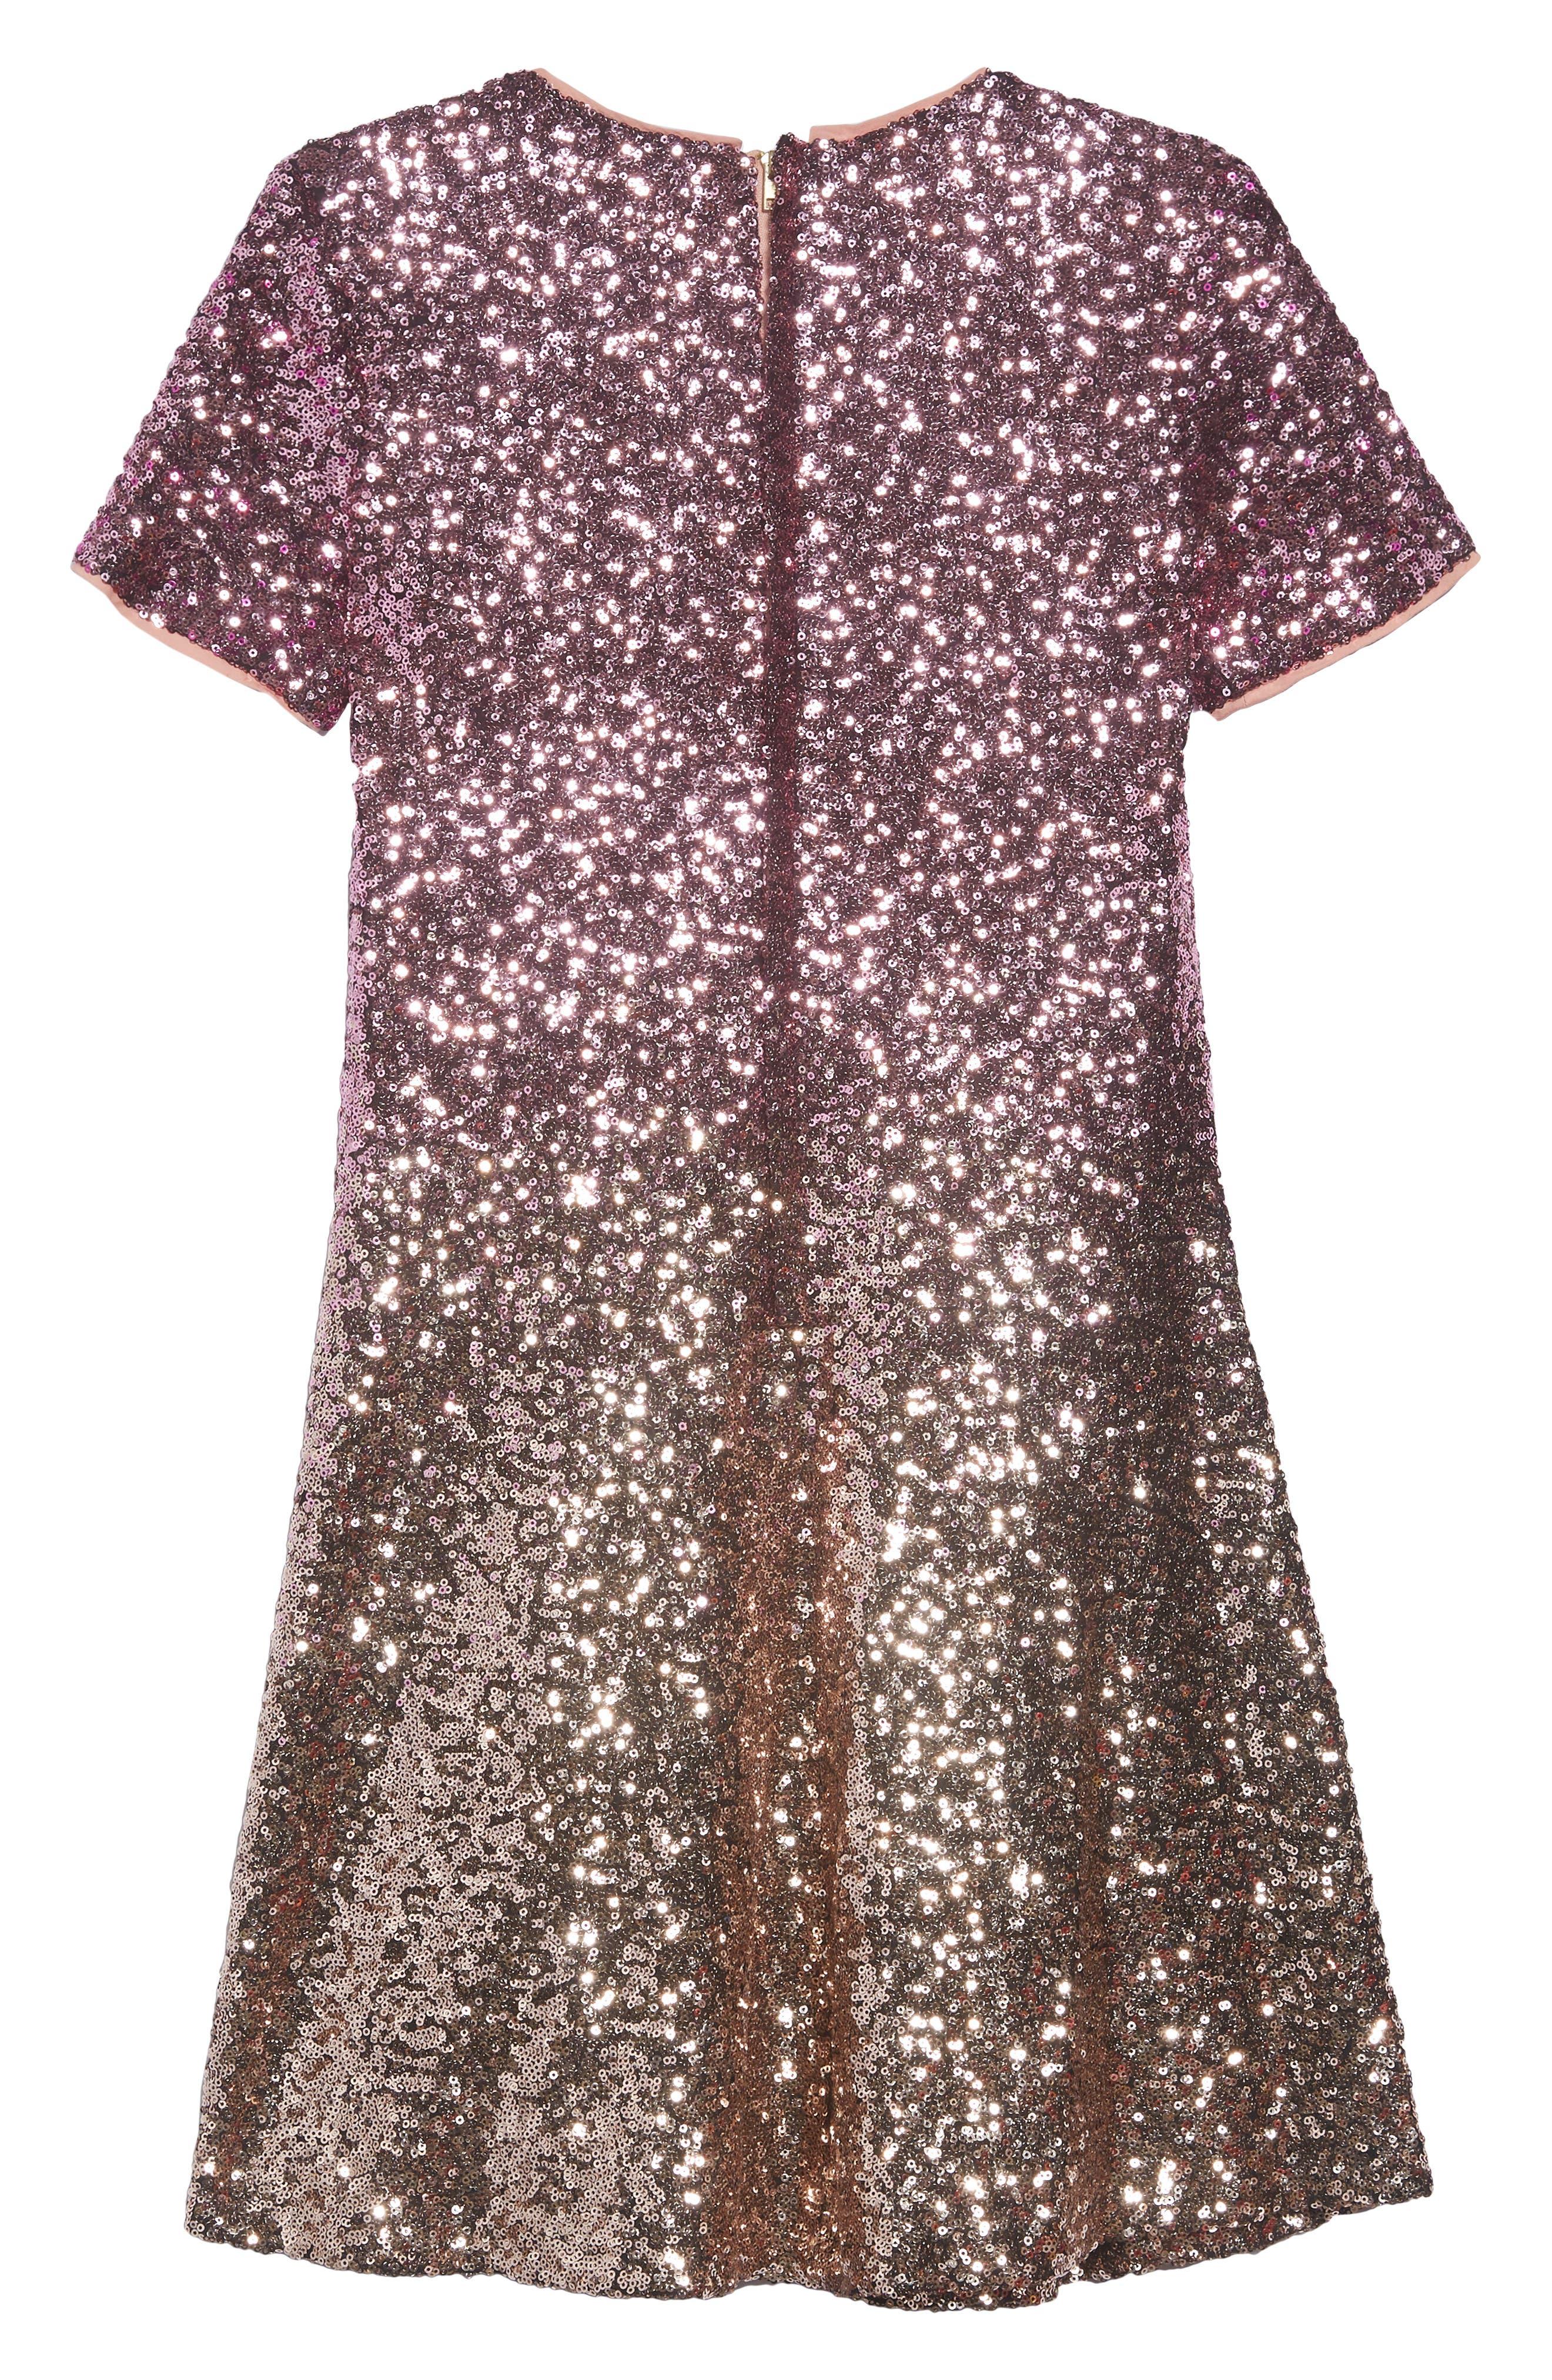 Ombré Sequin Skater Dress,                             Alternate thumbnail 2, color,                             710